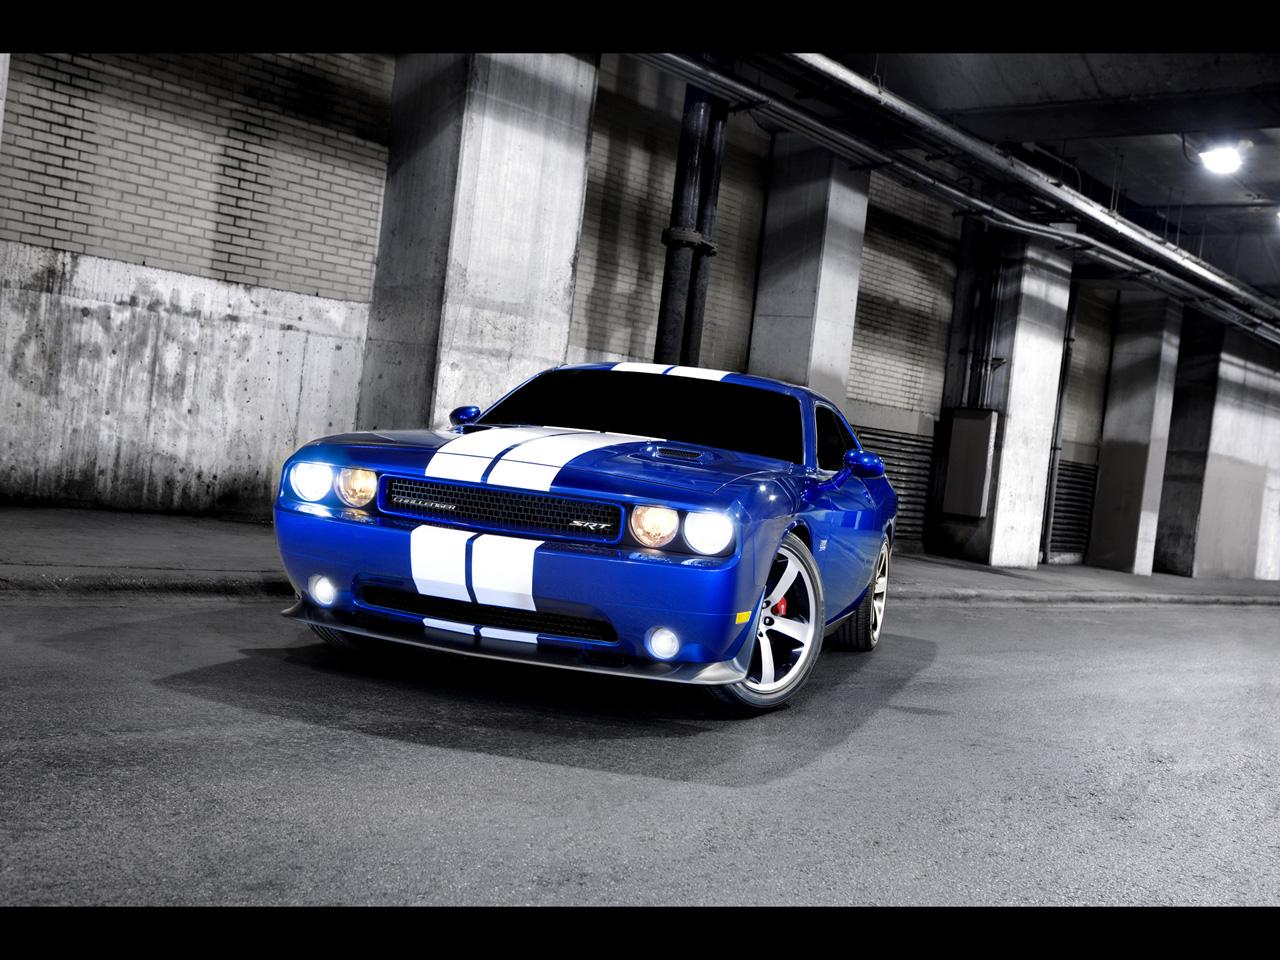 2011-dodge-challenger-srt8-392-front-angle-2-1280x960.jpg